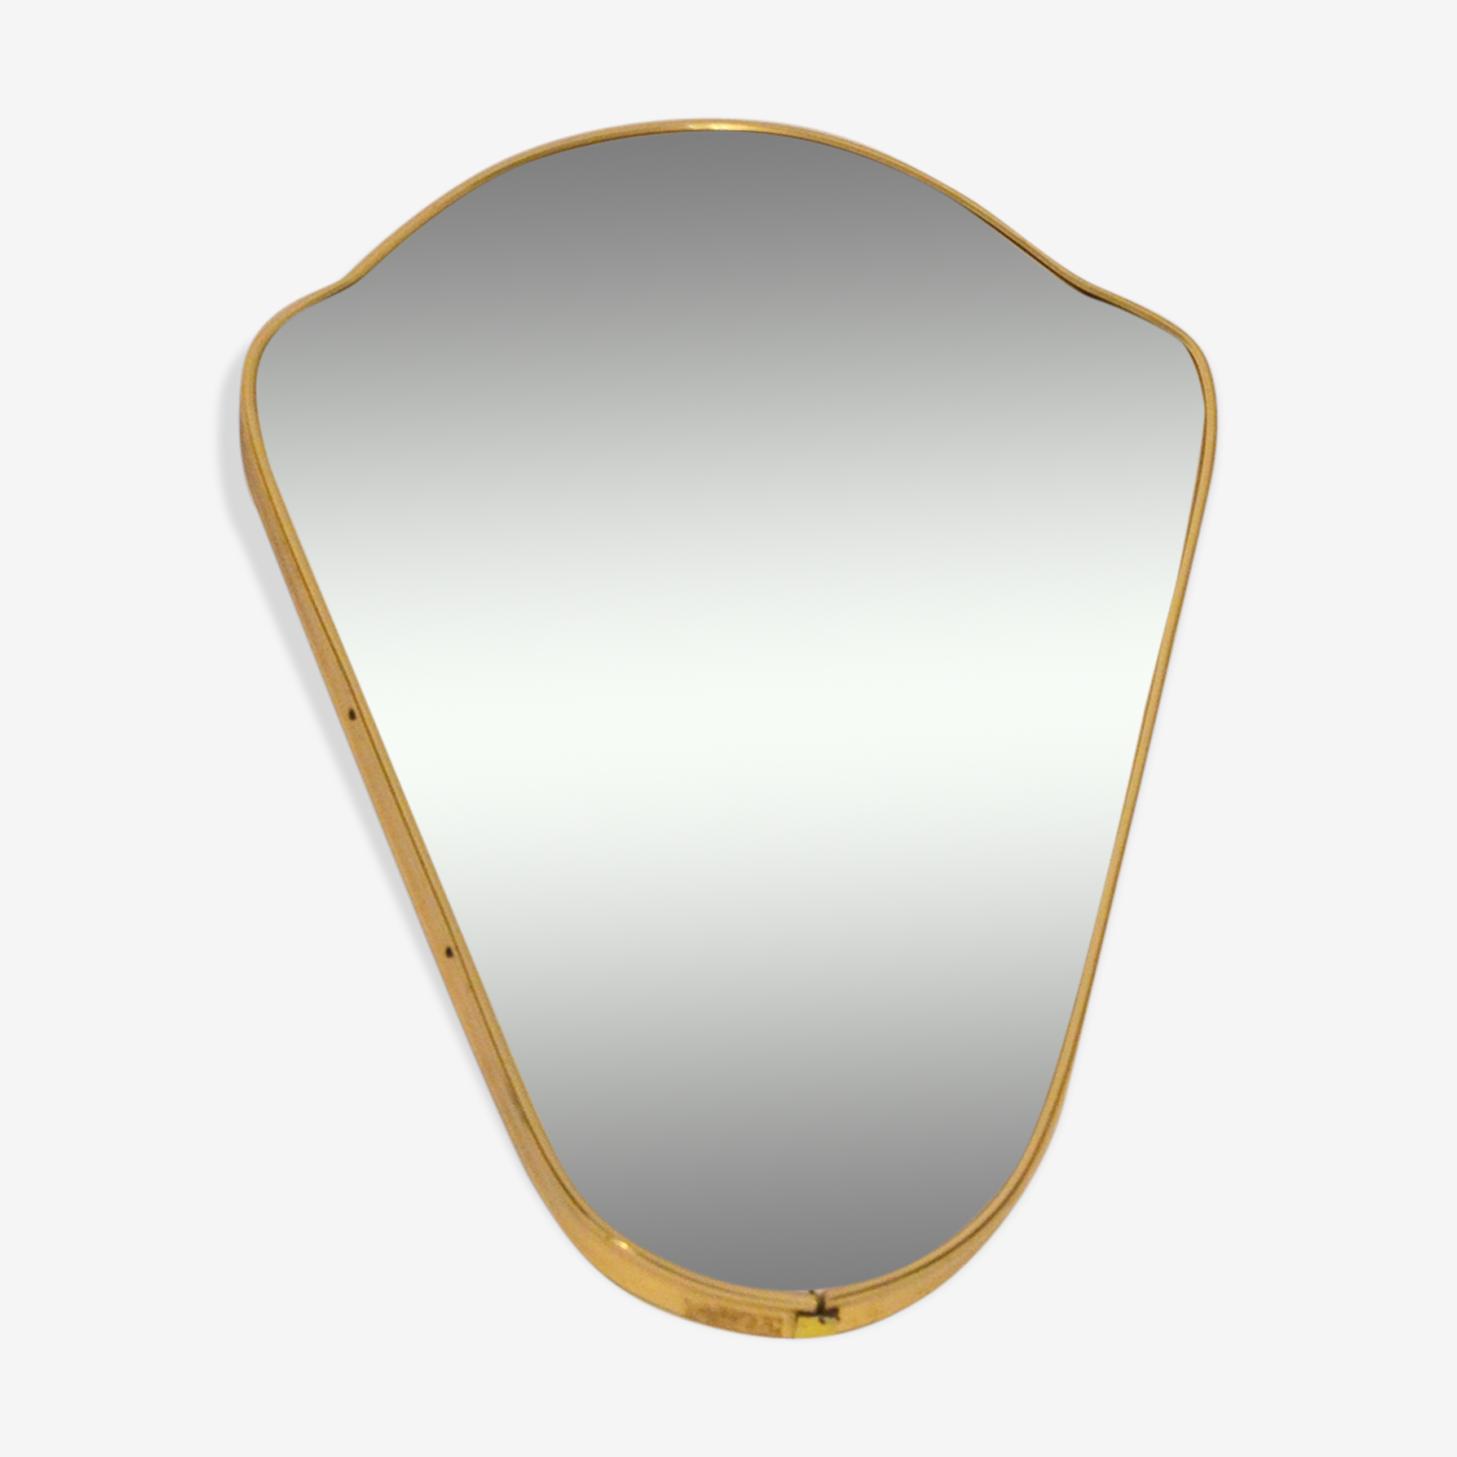 Free form mirror gold 40x26cm